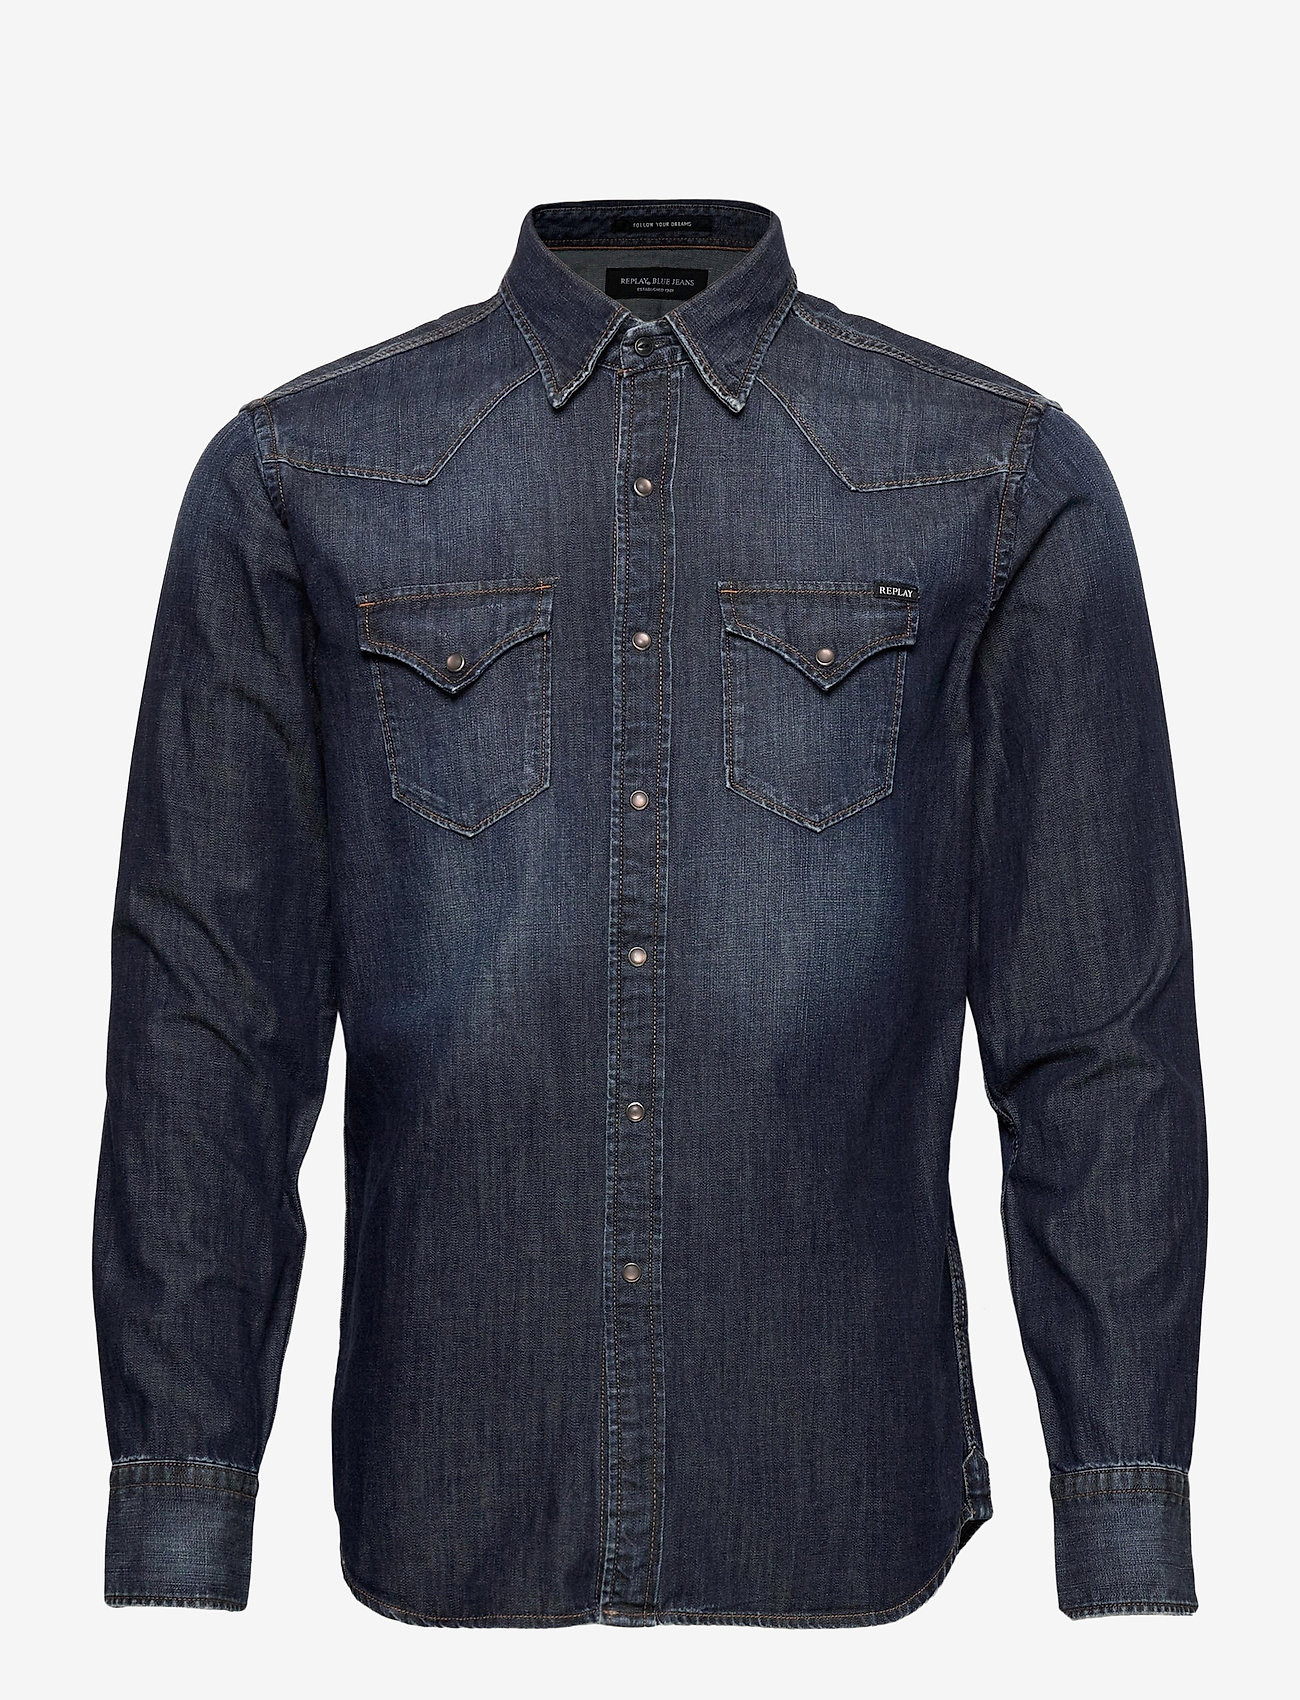 Replay - Shirt - peruspaitoja - dark blue - 0